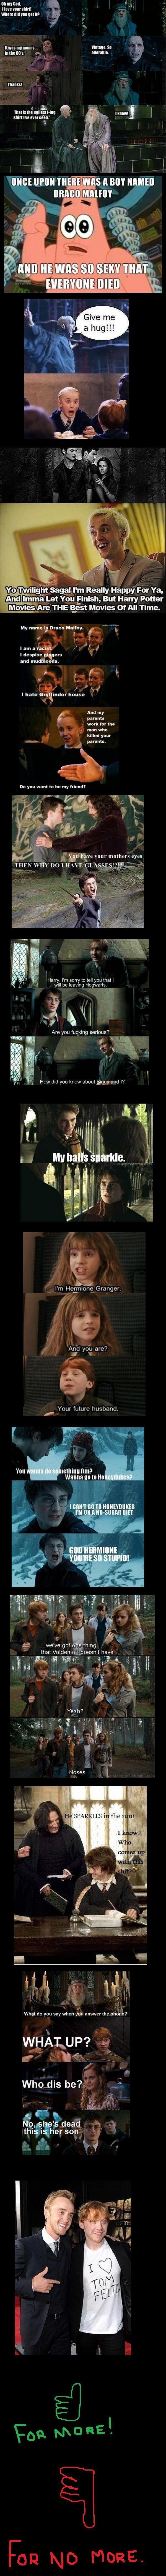 Harry Potter Lulz